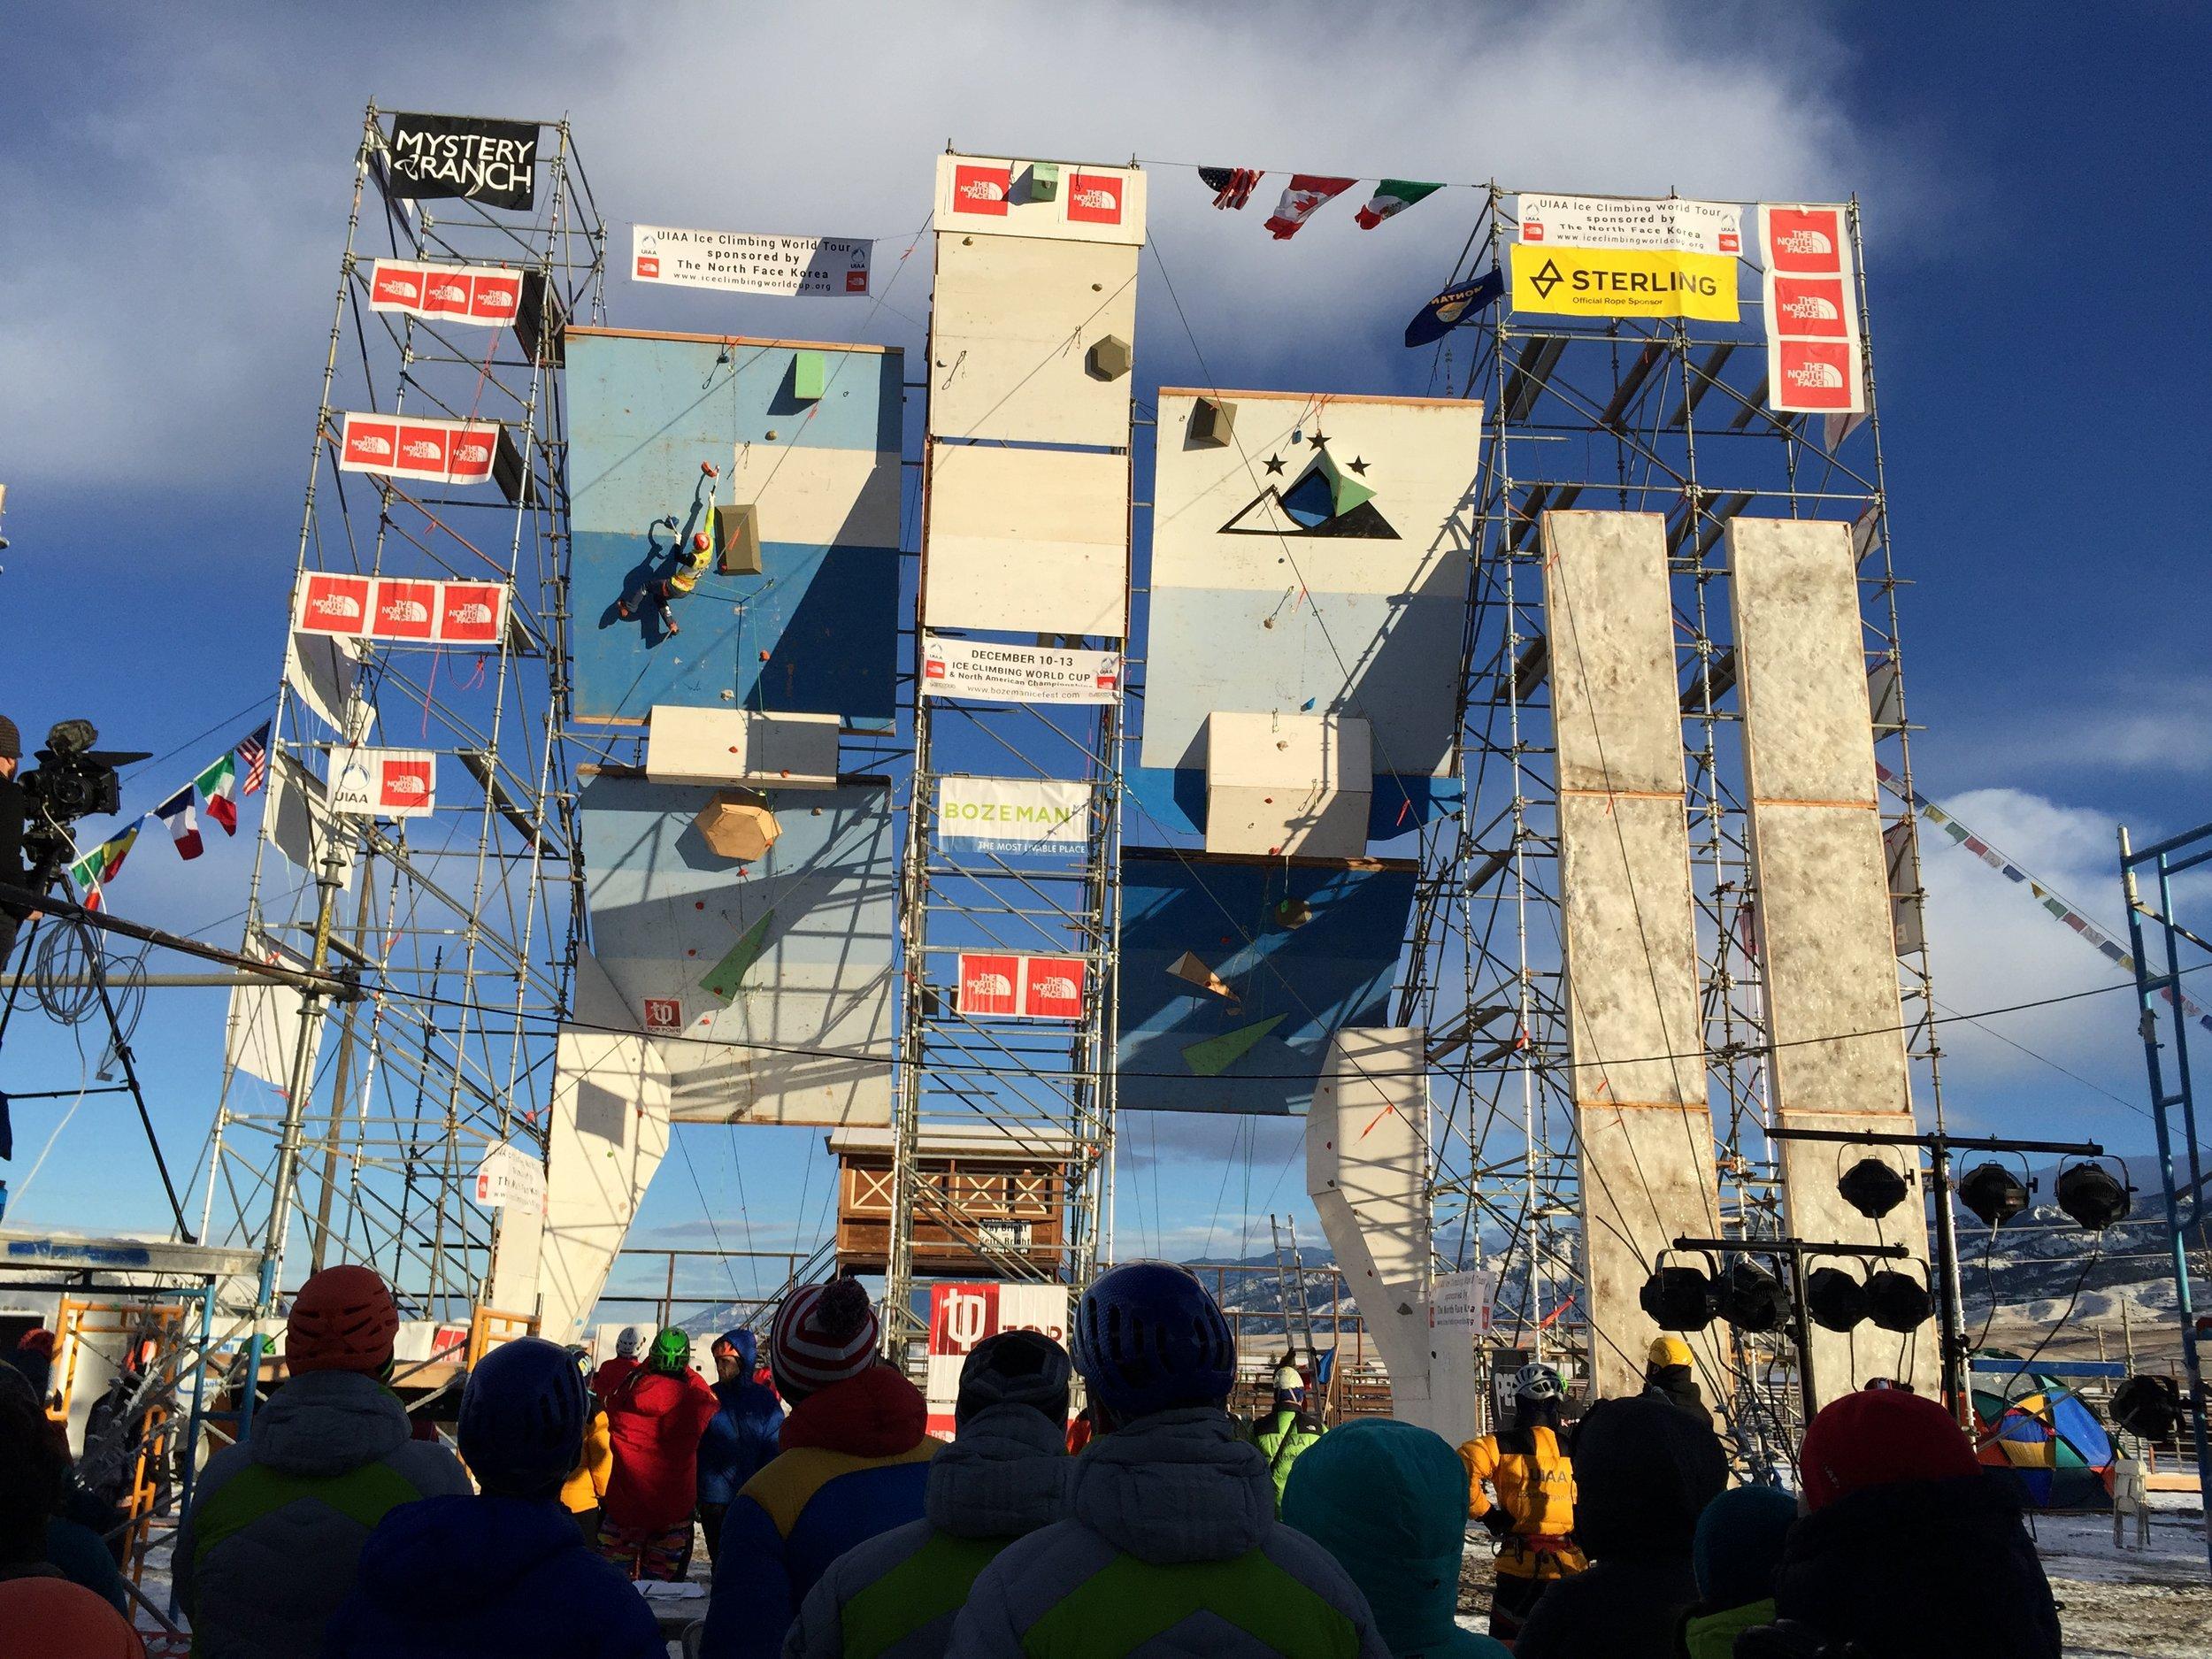 The 2016 Bozeman Ice Climbing World Cup